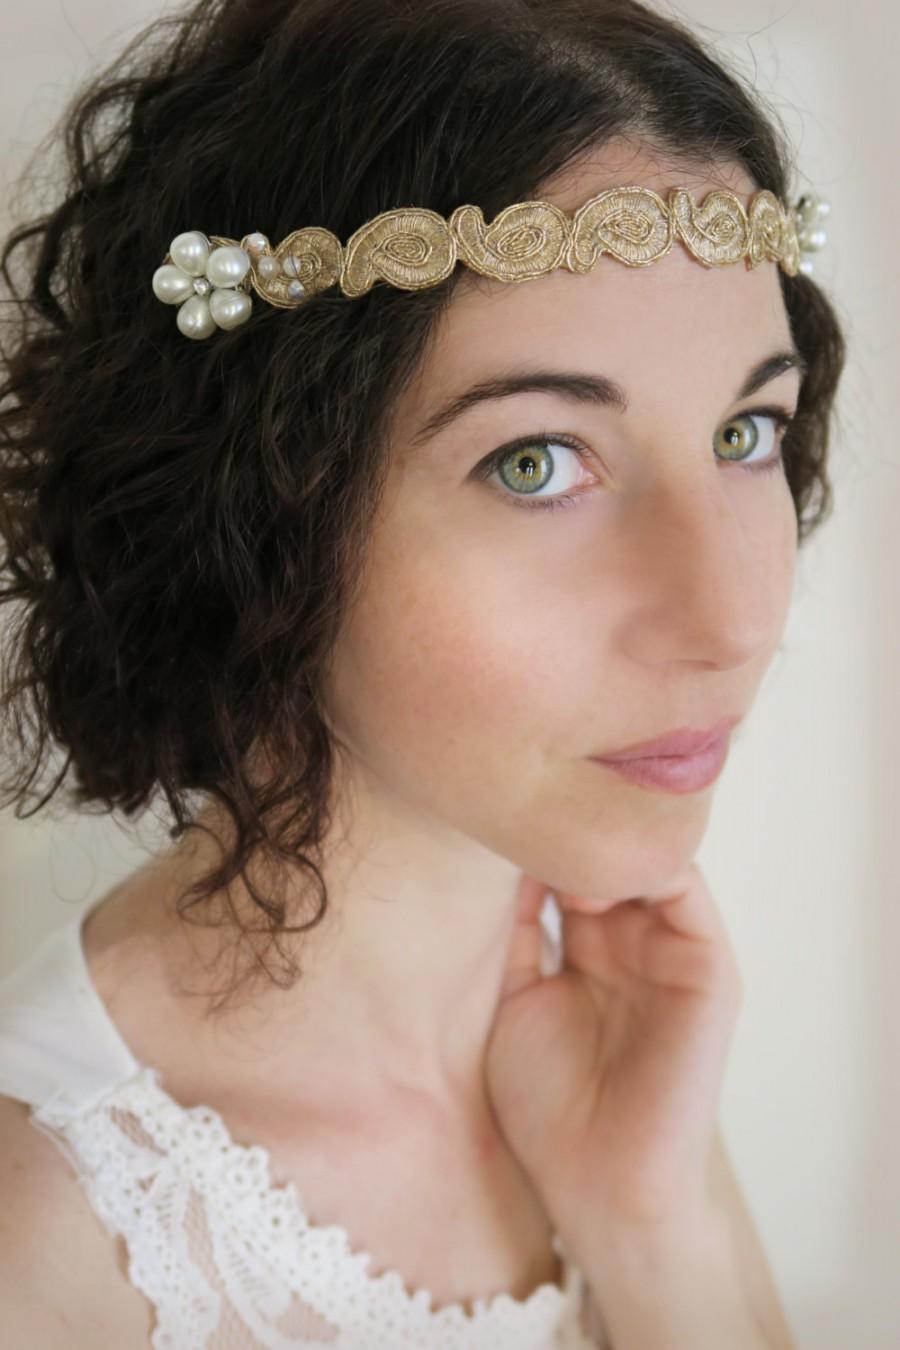 bridal lace headband, wedding lace tiara headband with hair combs